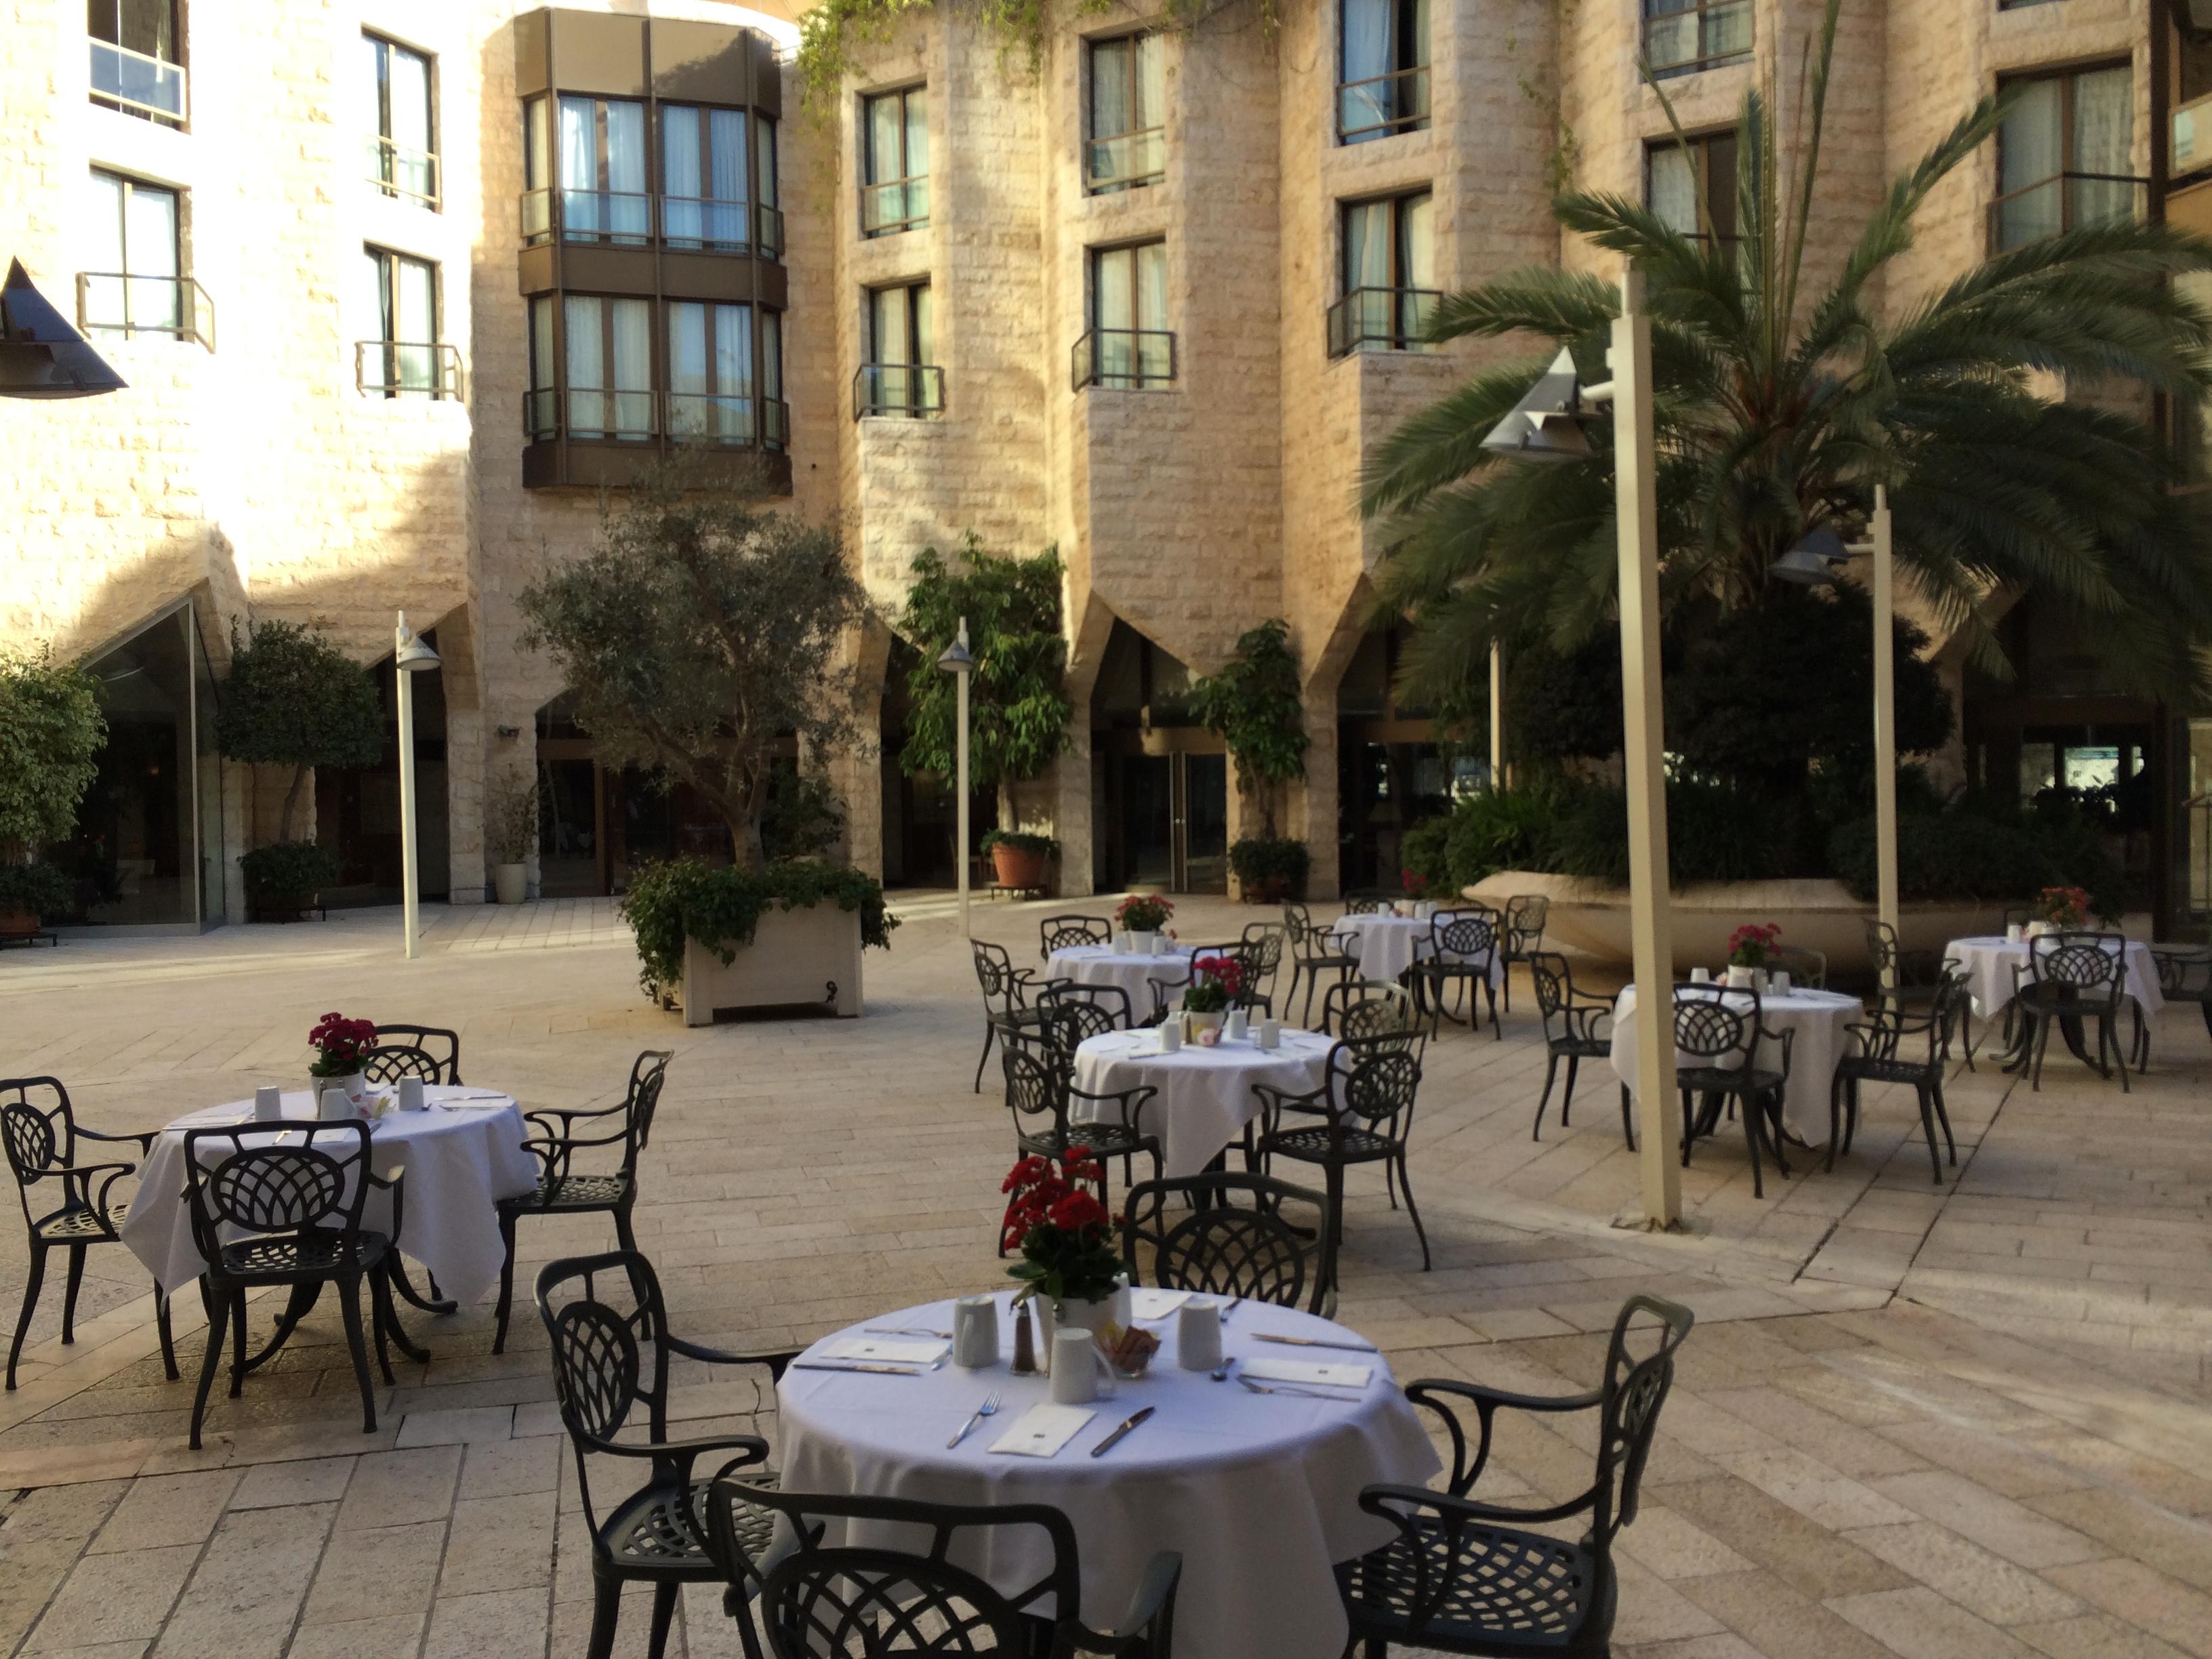 My Visit to Israel (Part 7)